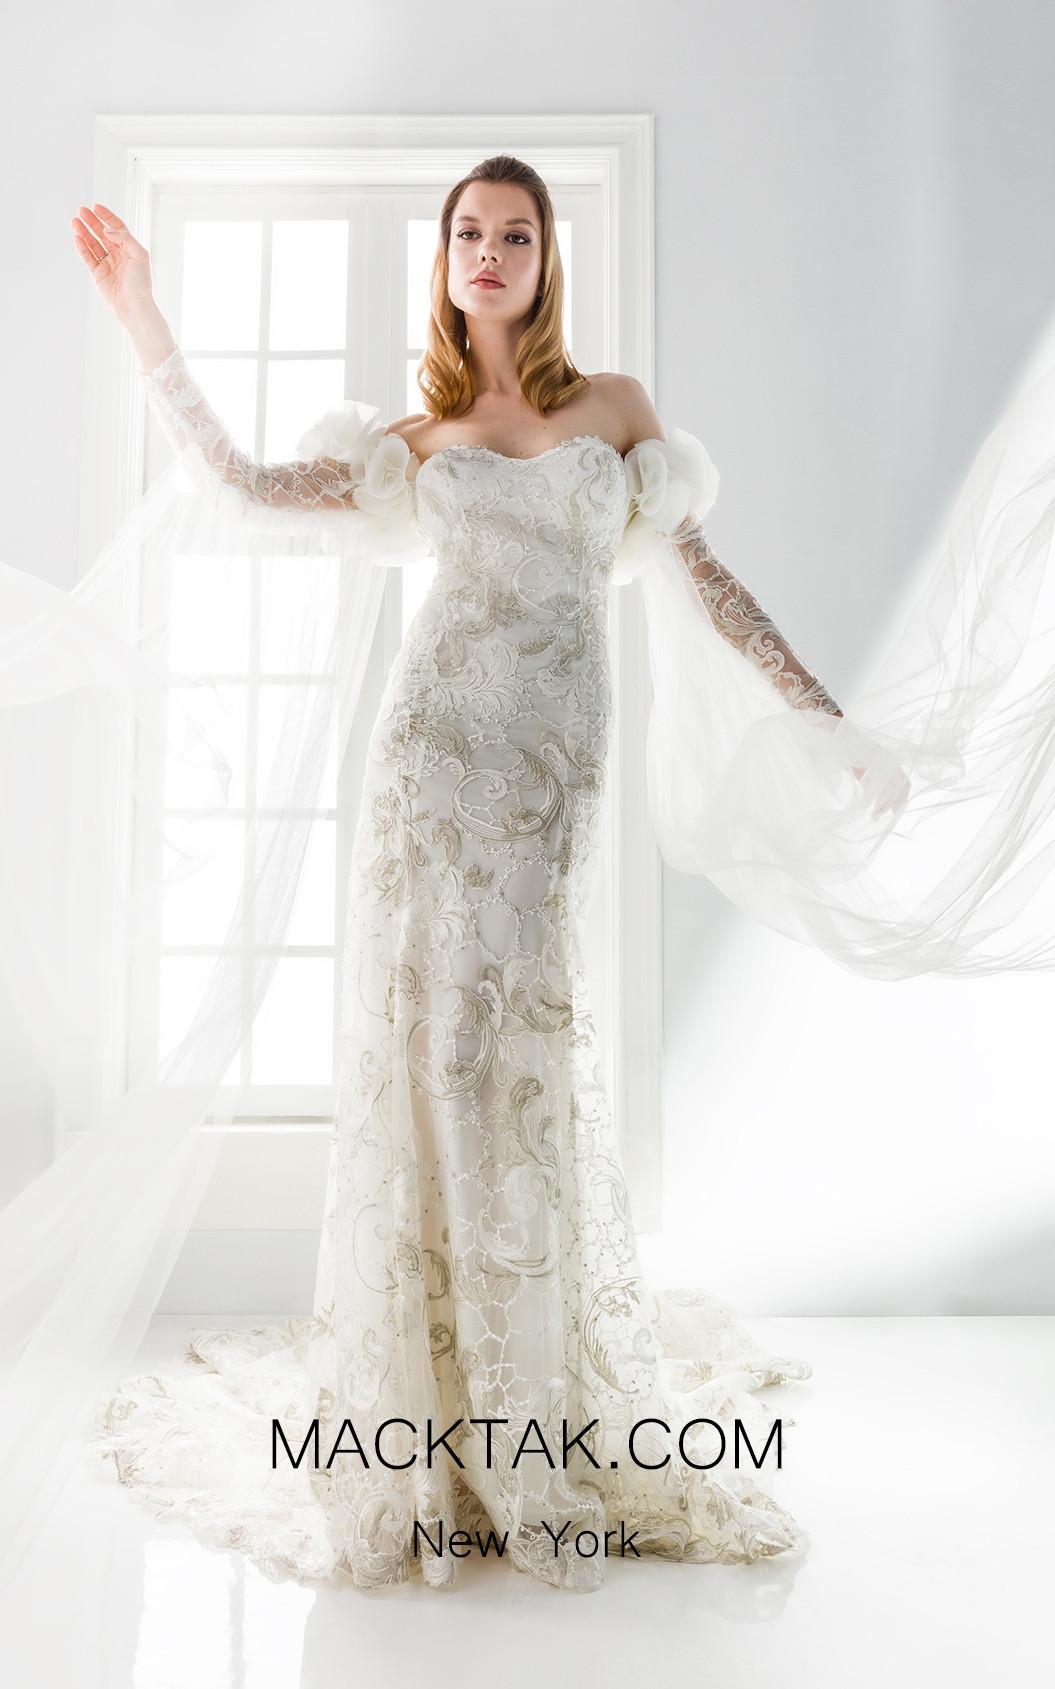 Jiouli Kastalia 773 Ivory Front Wedding Dress